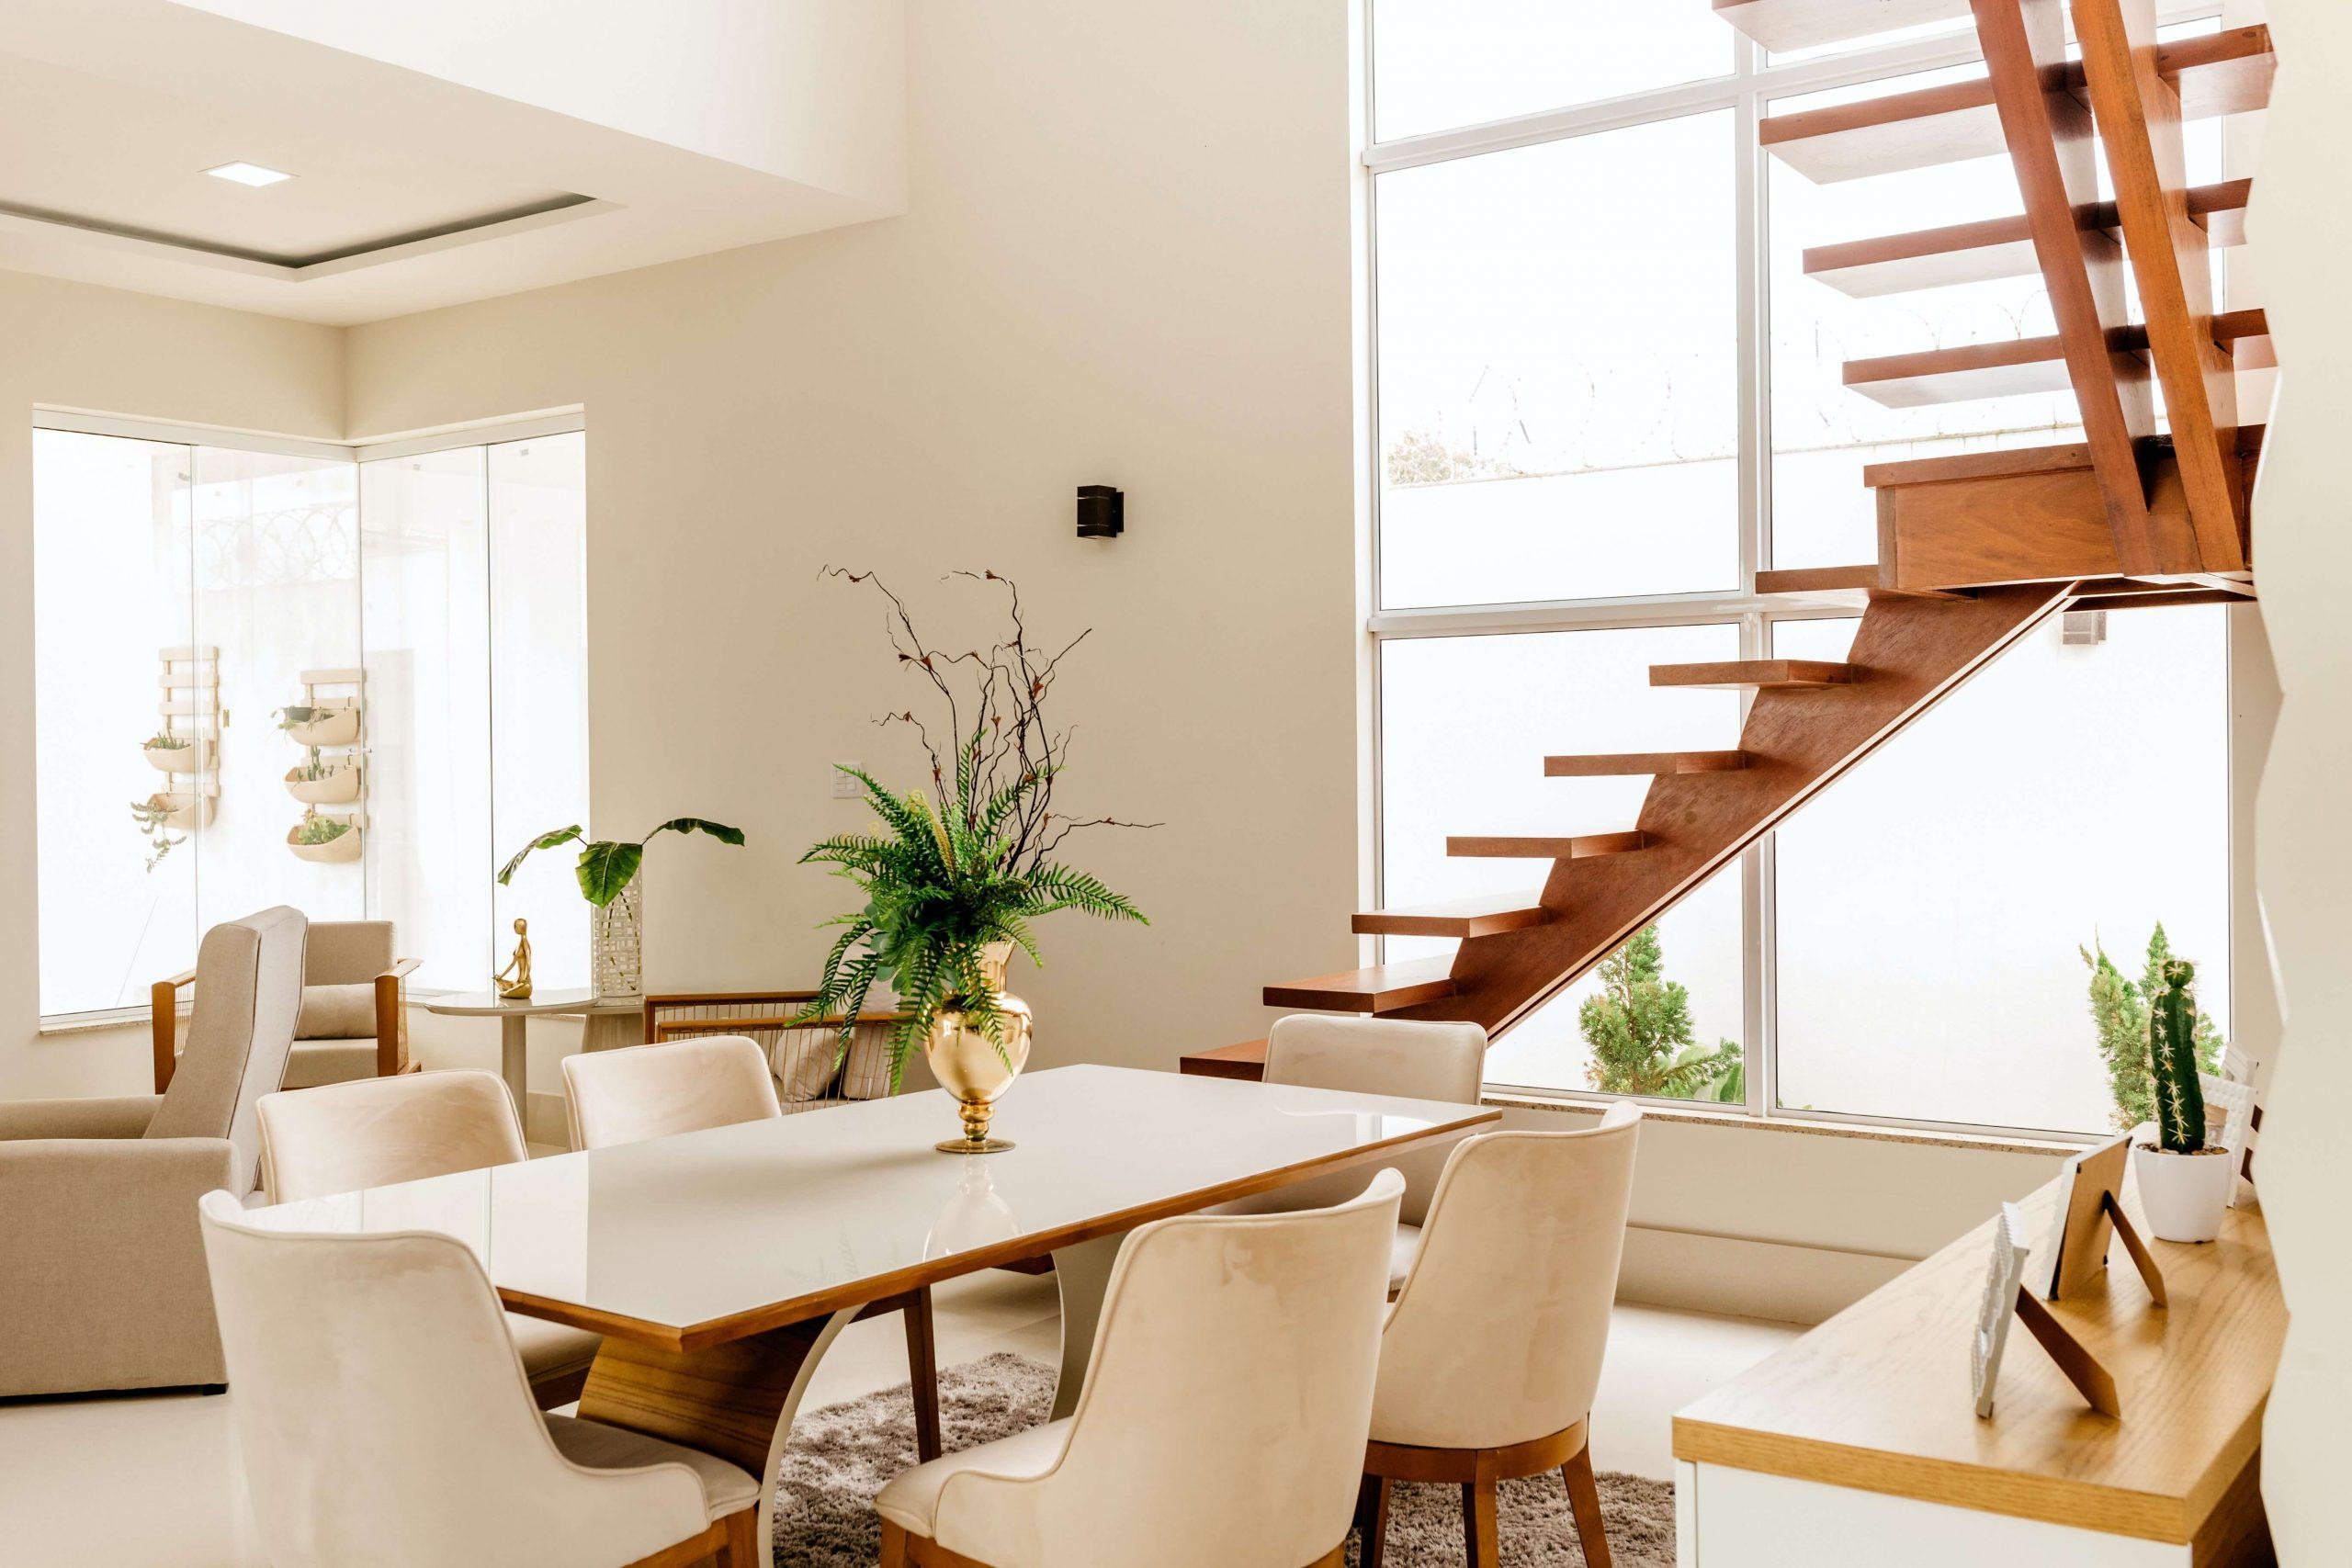 Interieure-renovation-CLaraux